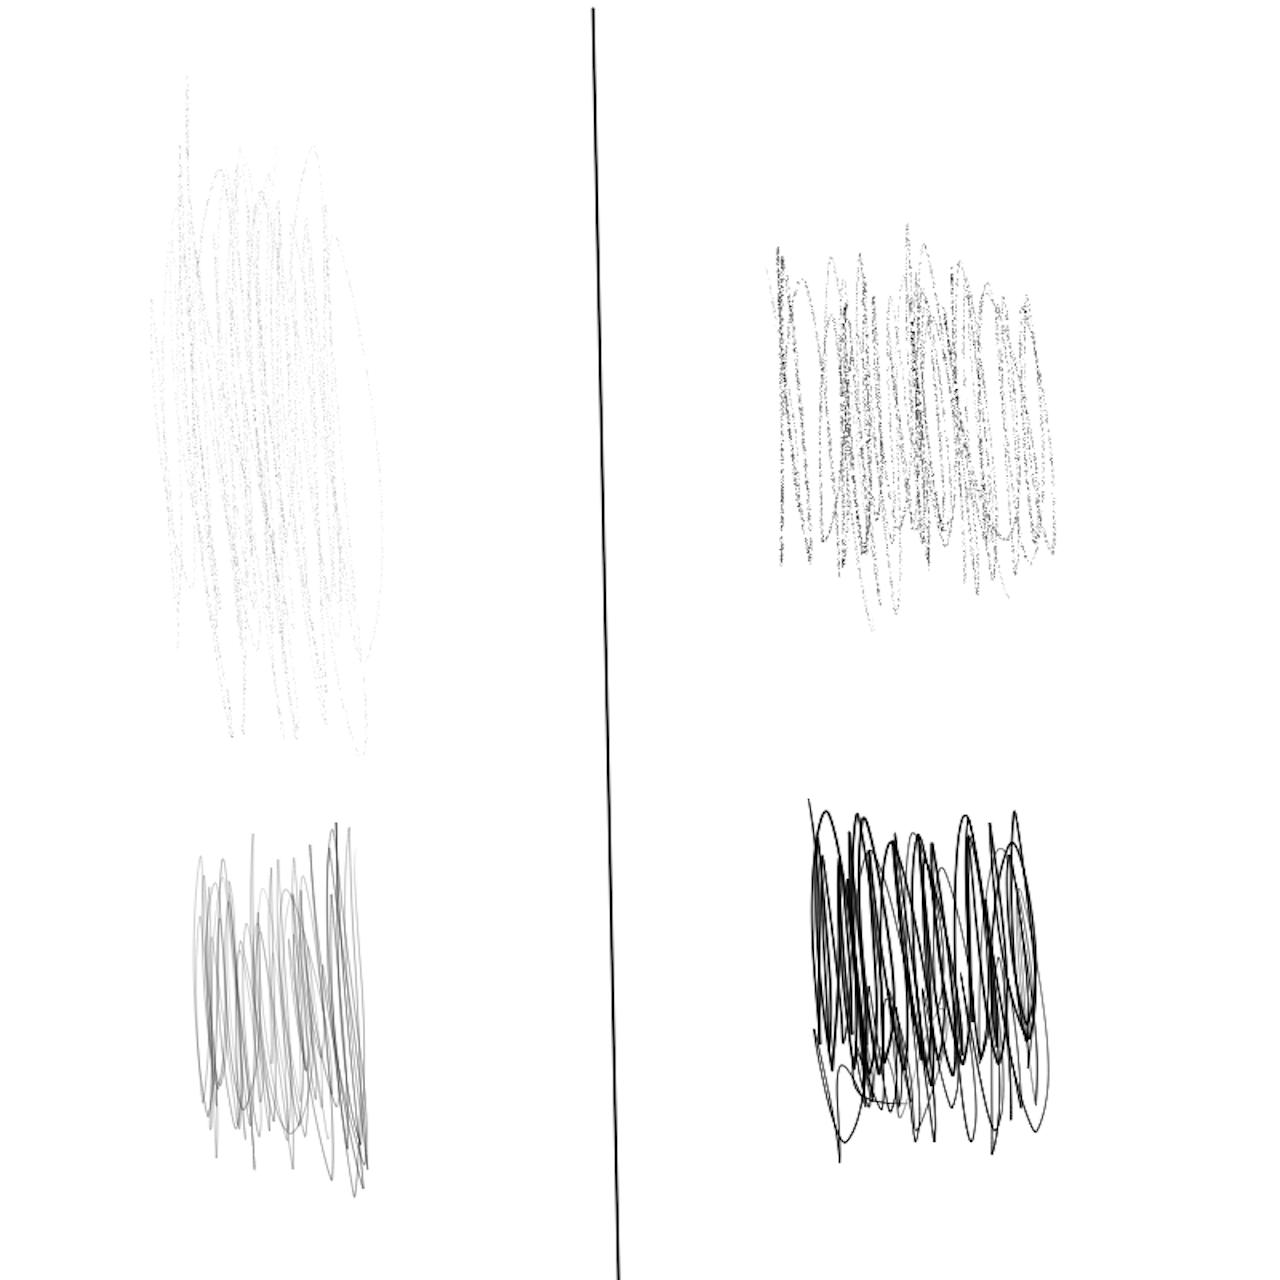 XP-Pen Deco 01 v2の感度を変更したサンプル